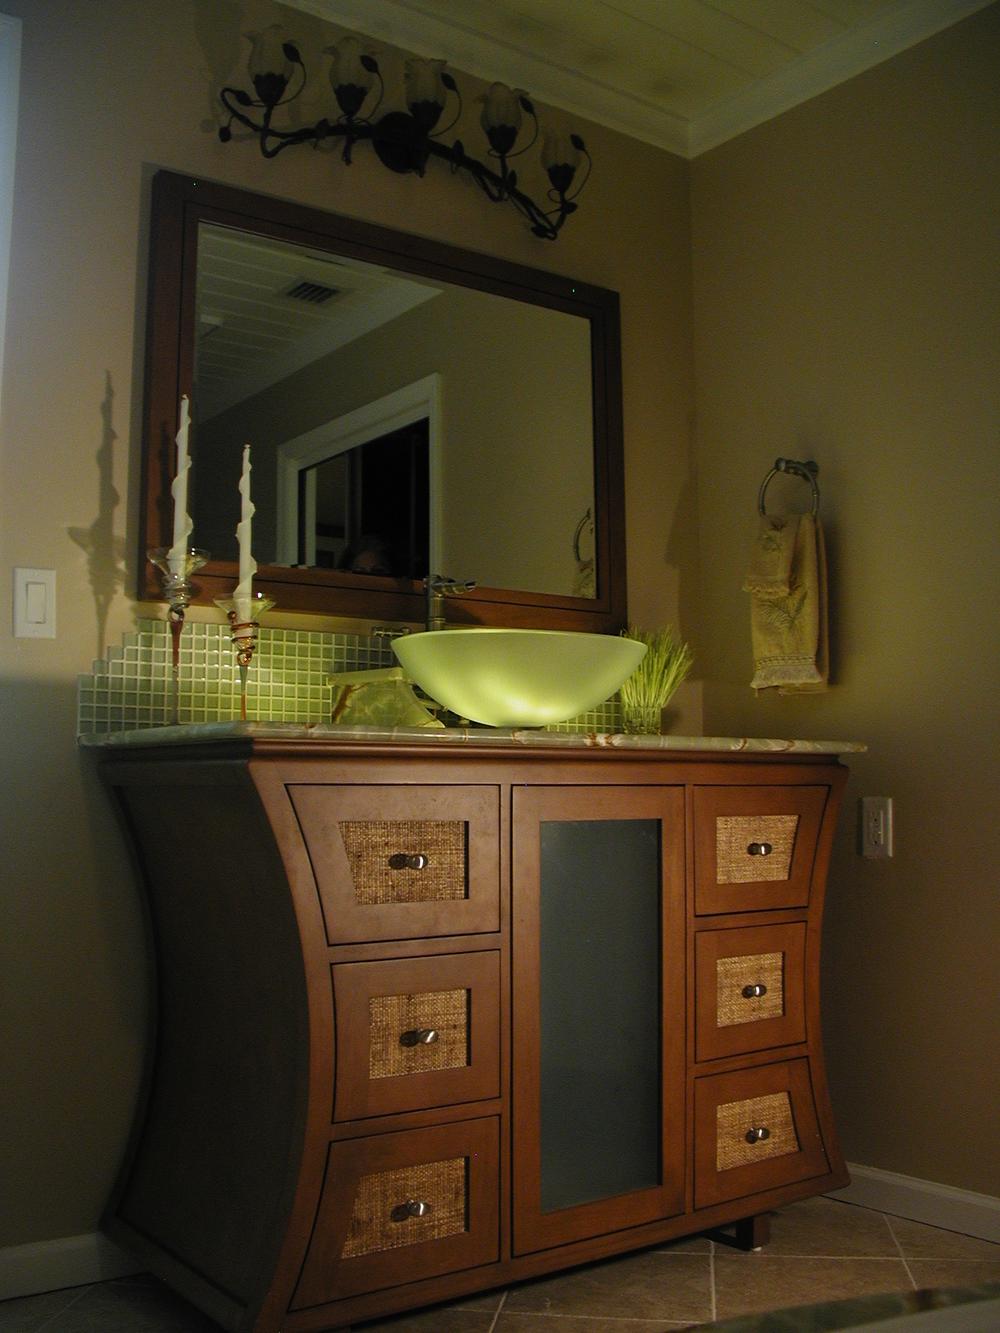 Zuba Hse 1 M Bath Vanity 2.JPG